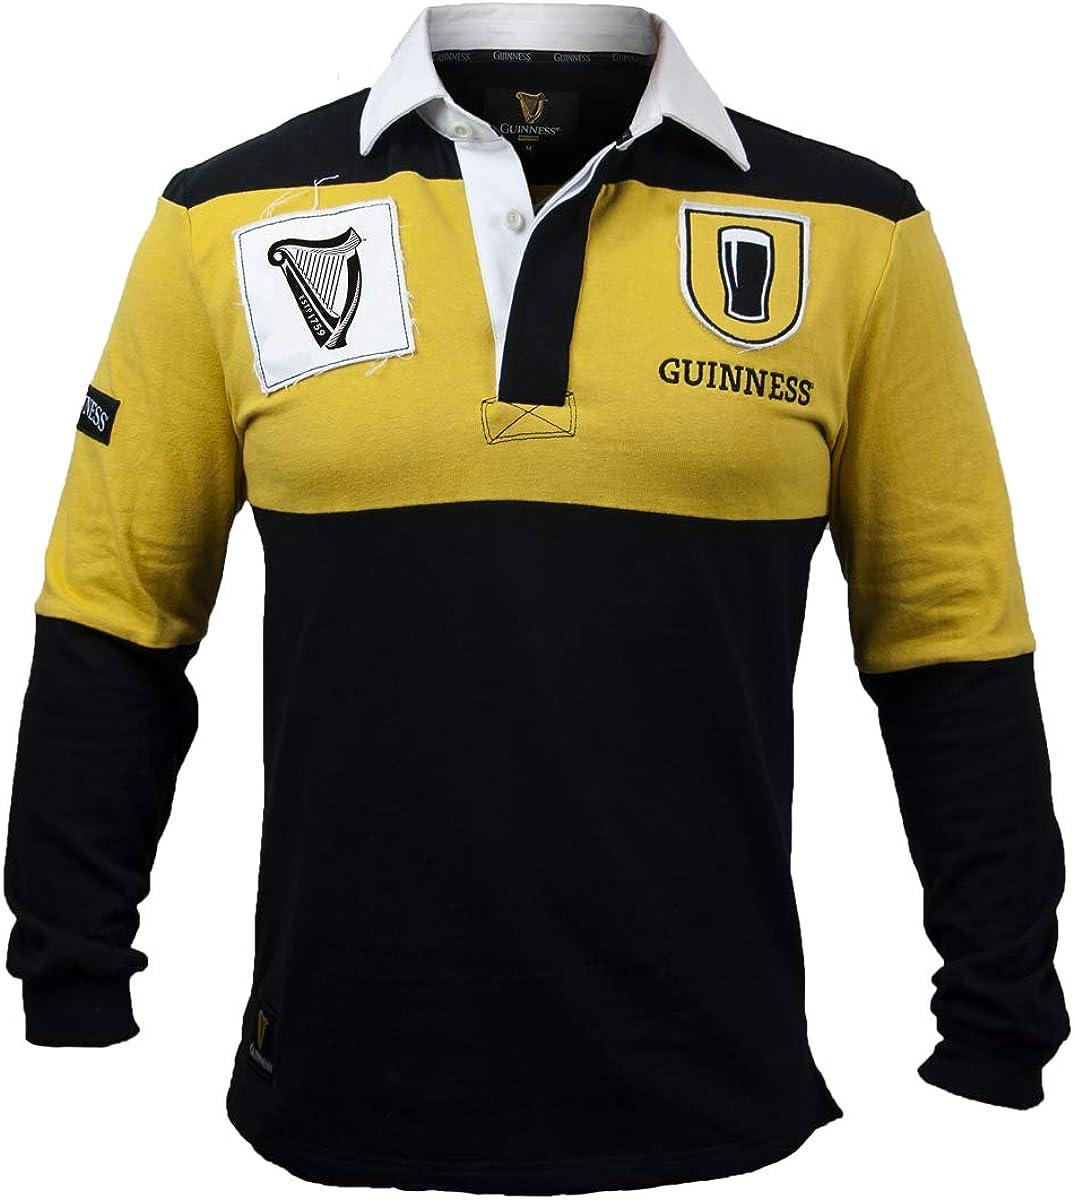 Guinness Mustard Black Popular overseas Jersey Rugby Popular product